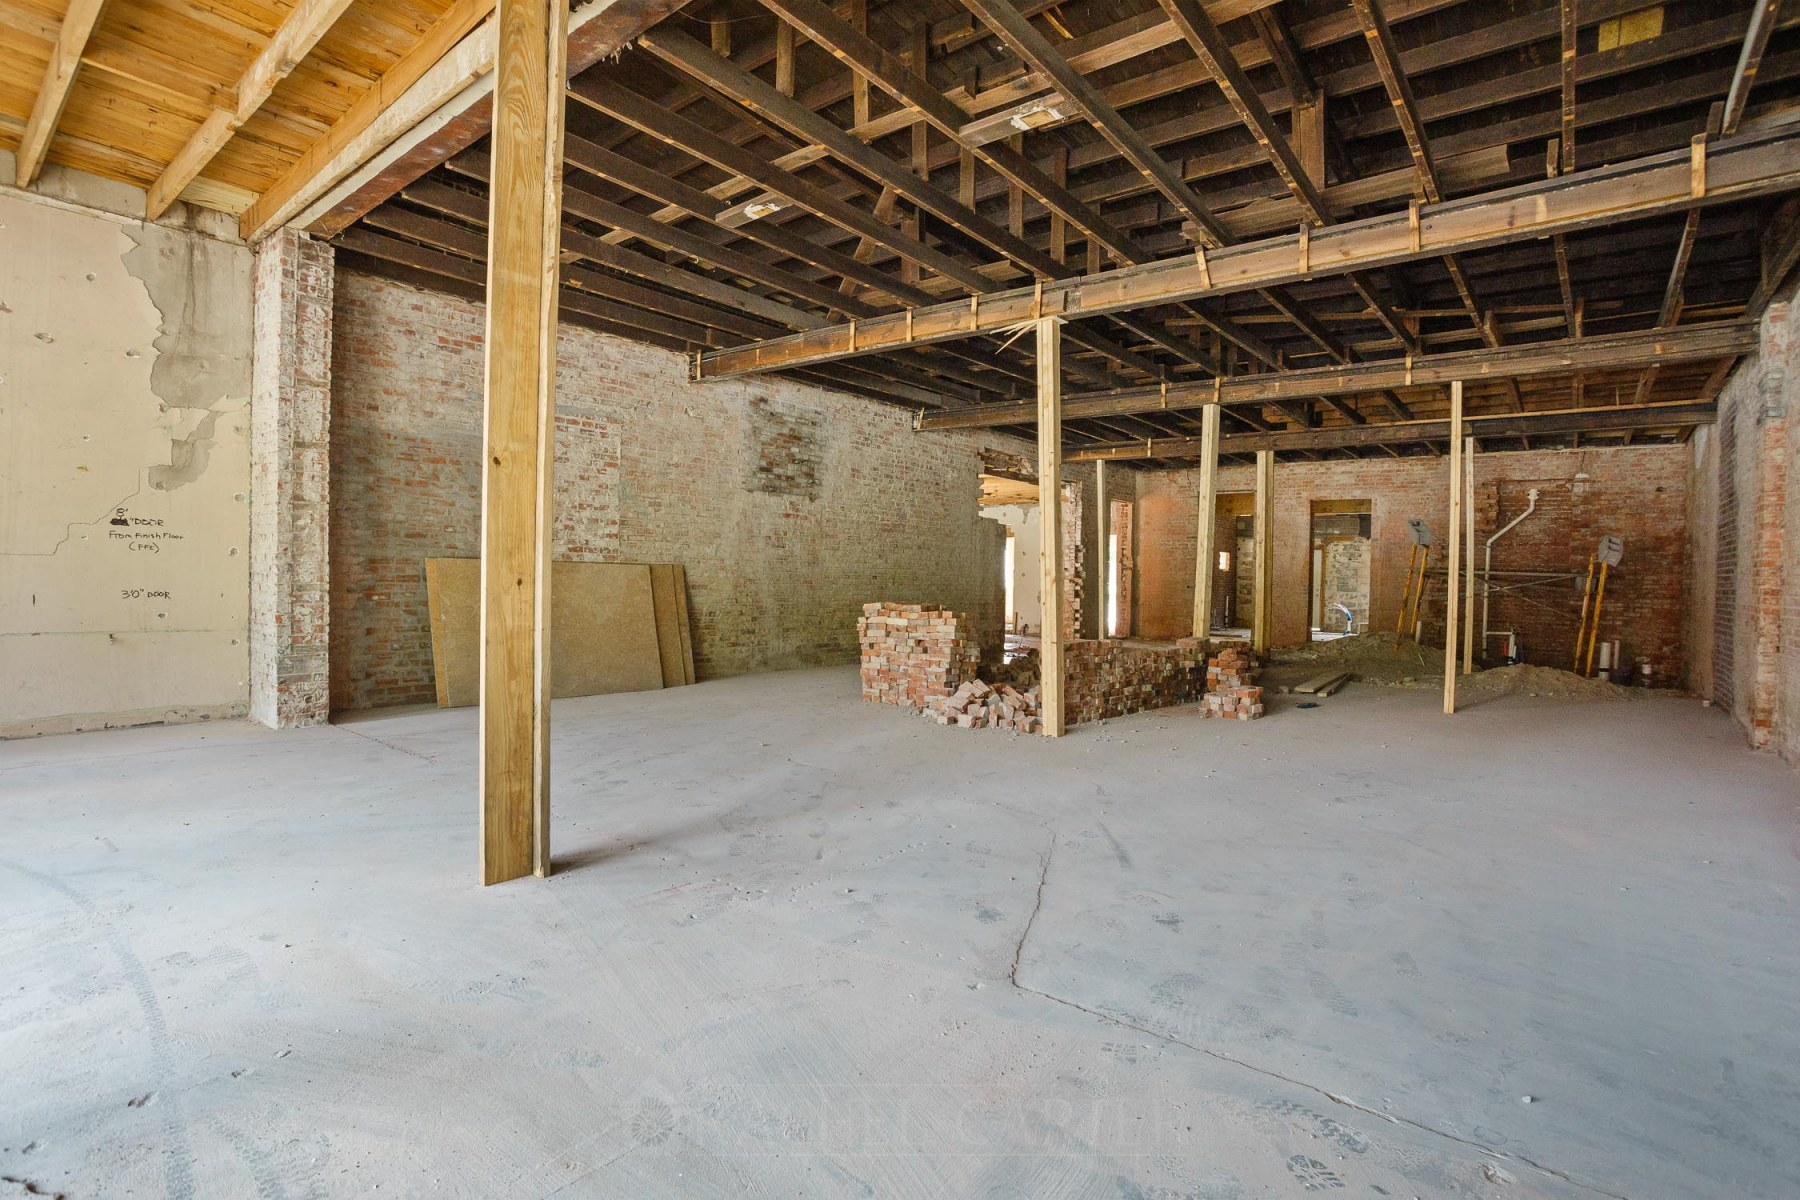 Horizons-East-Office-Renovation-1st-Set-27May2021_SB_01299_web-size